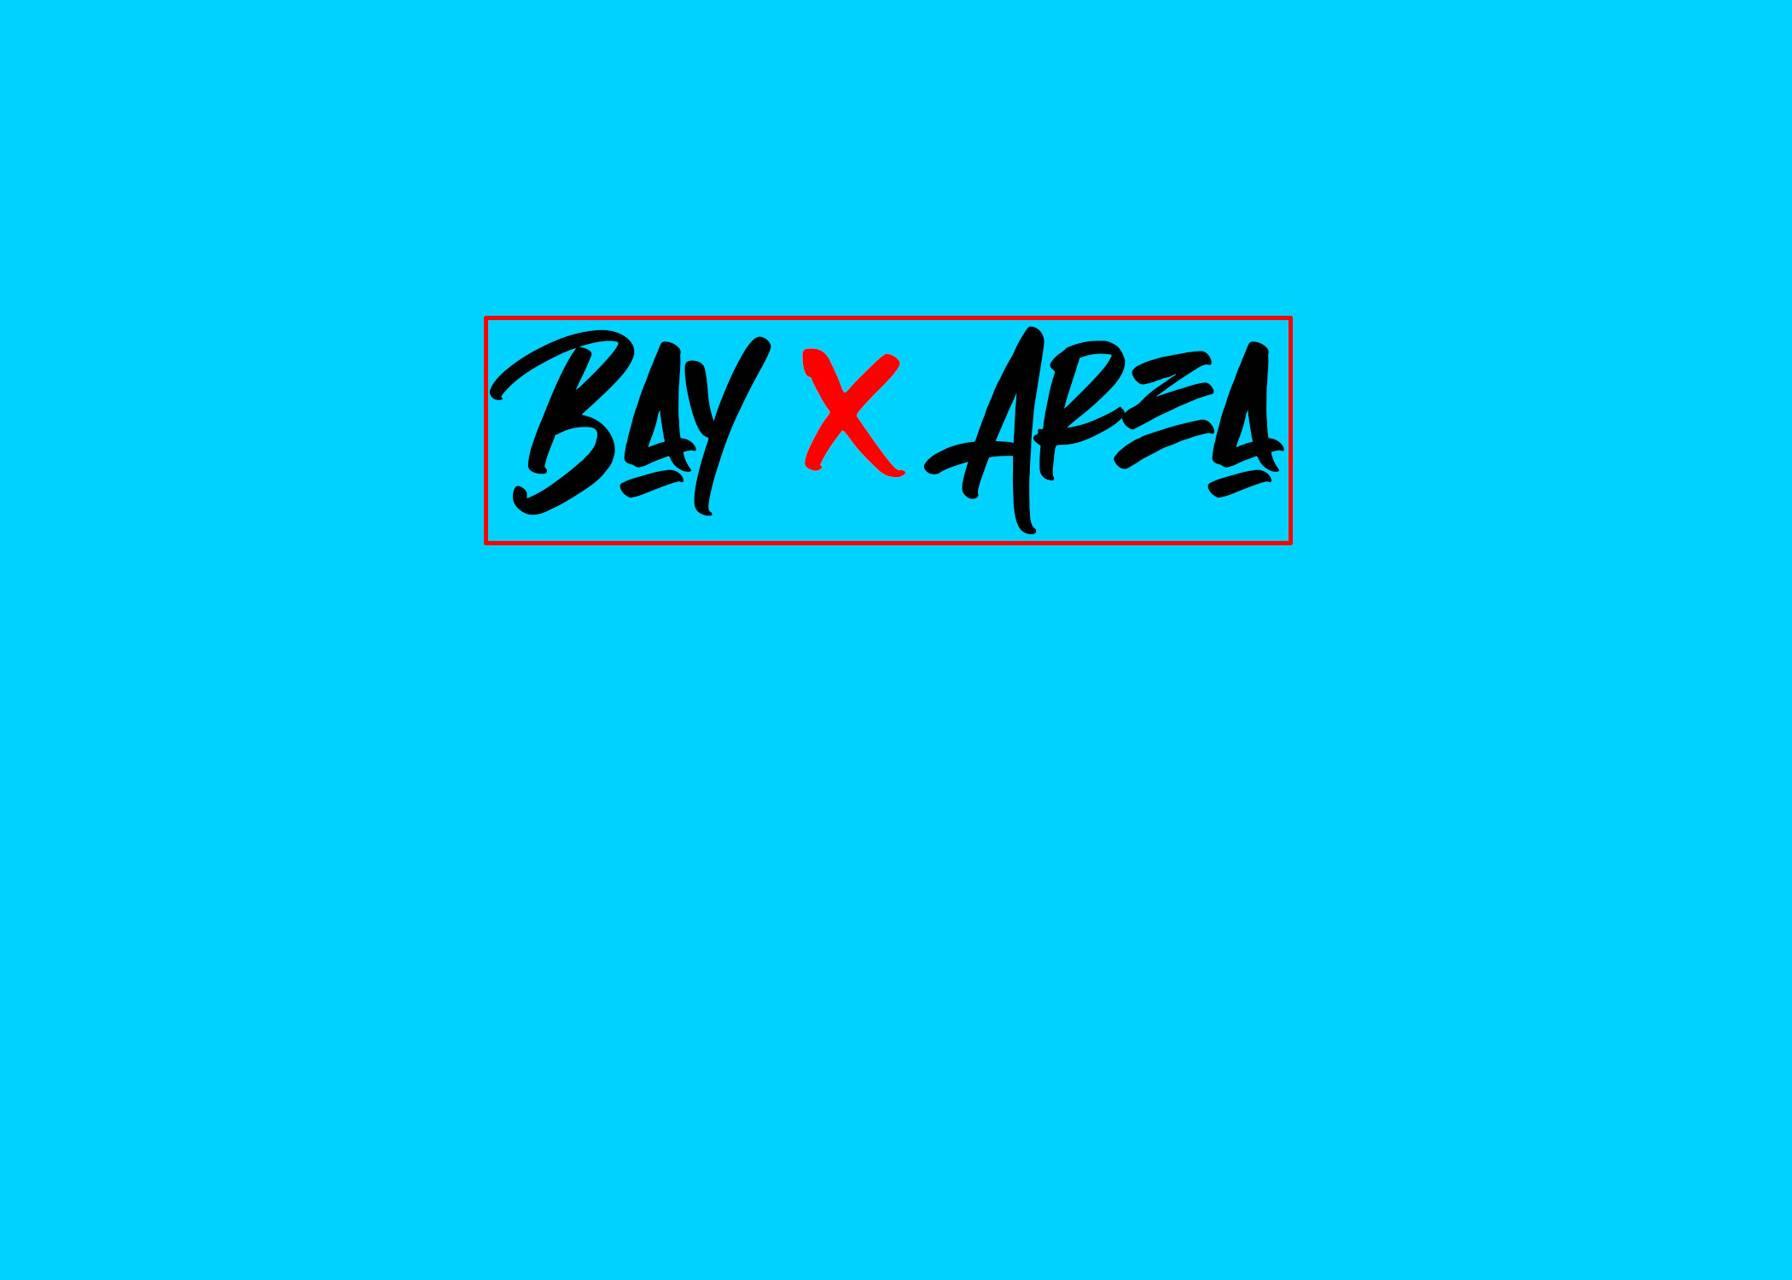 Bay x Area